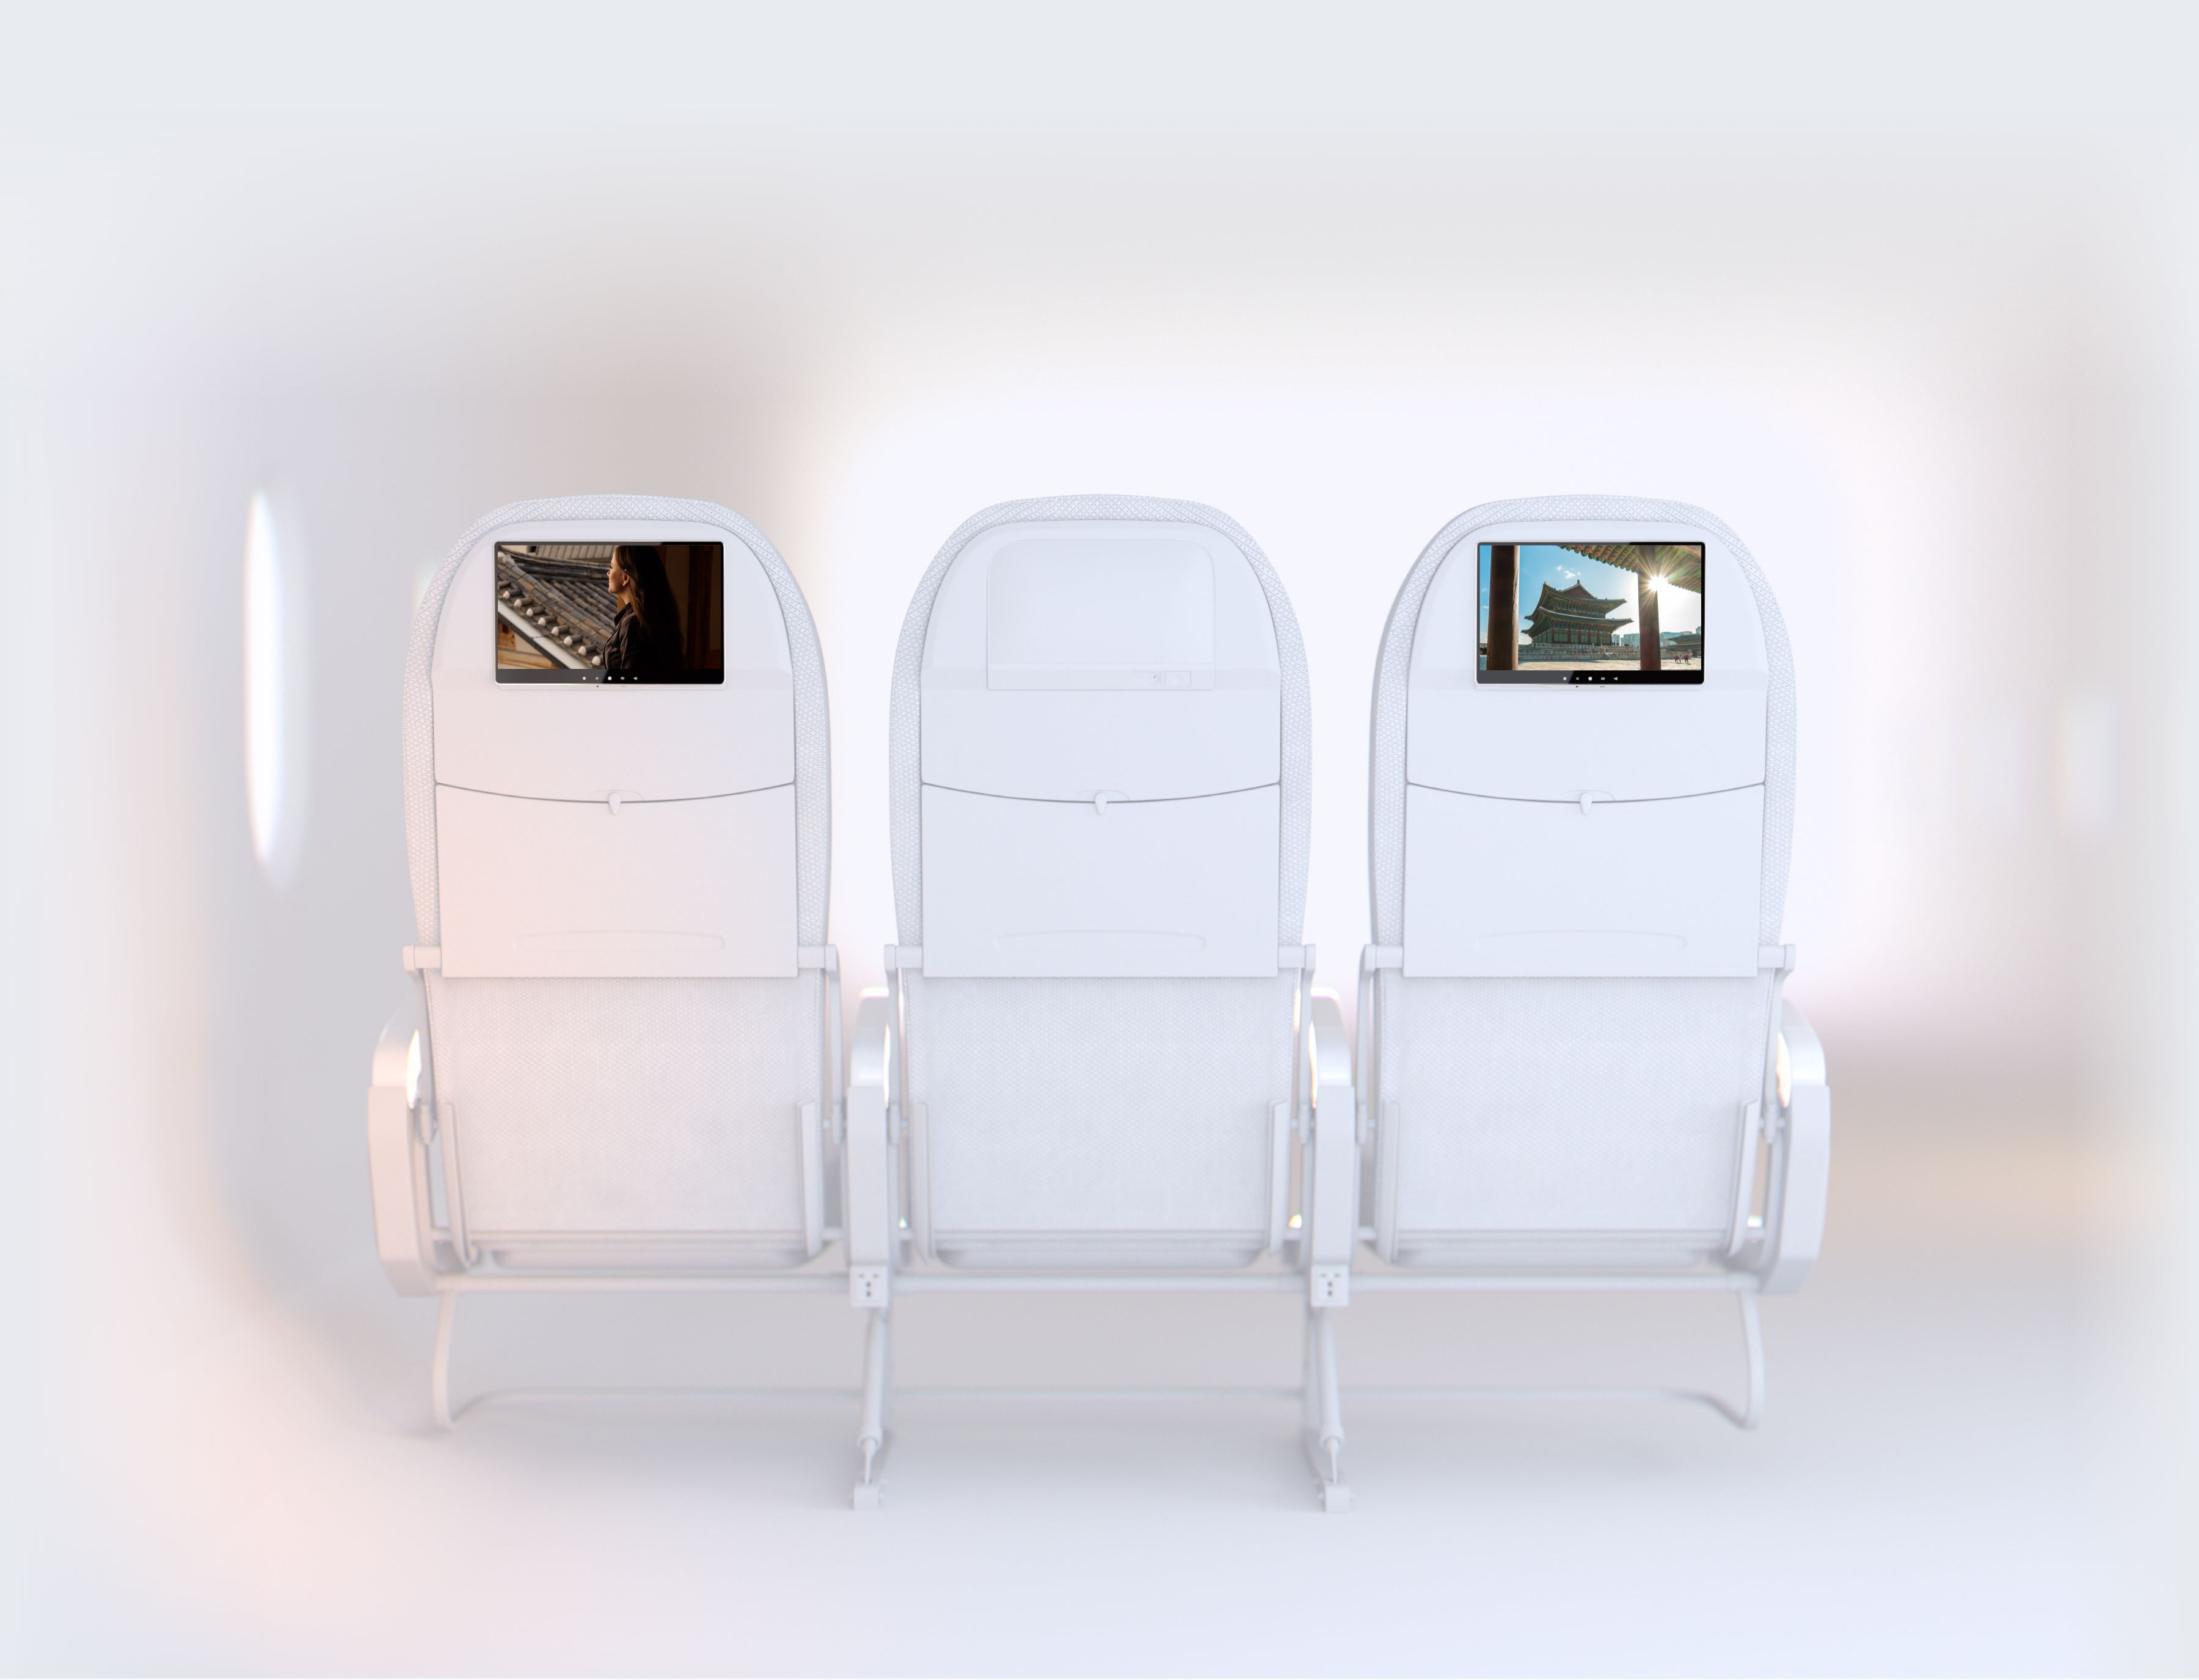 Airplane Seat Row